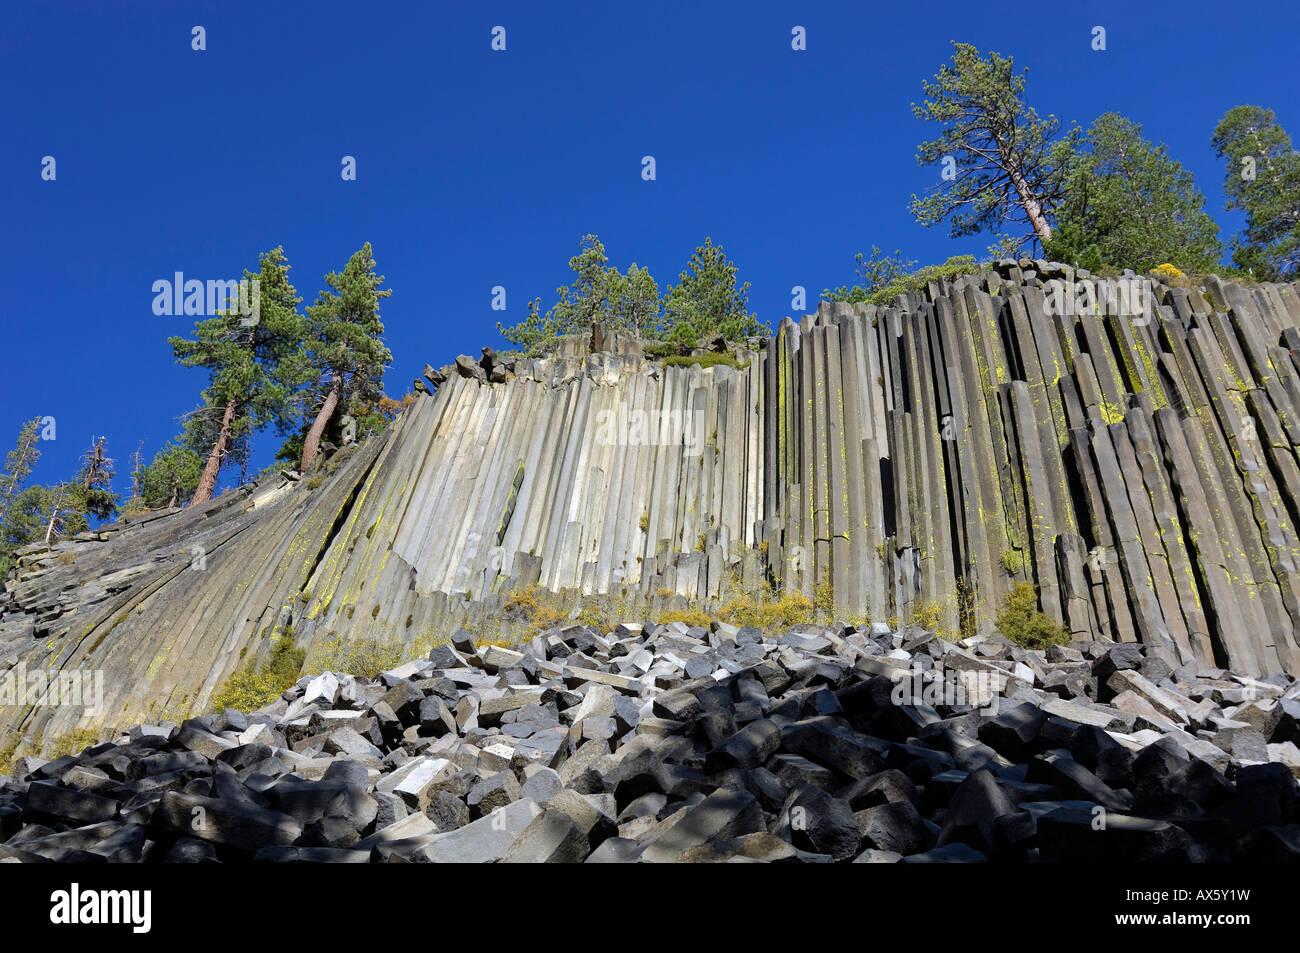 Basalt columns at Mammoth Lake, Devil's Postpile National Monument, California, USA - Stock Image